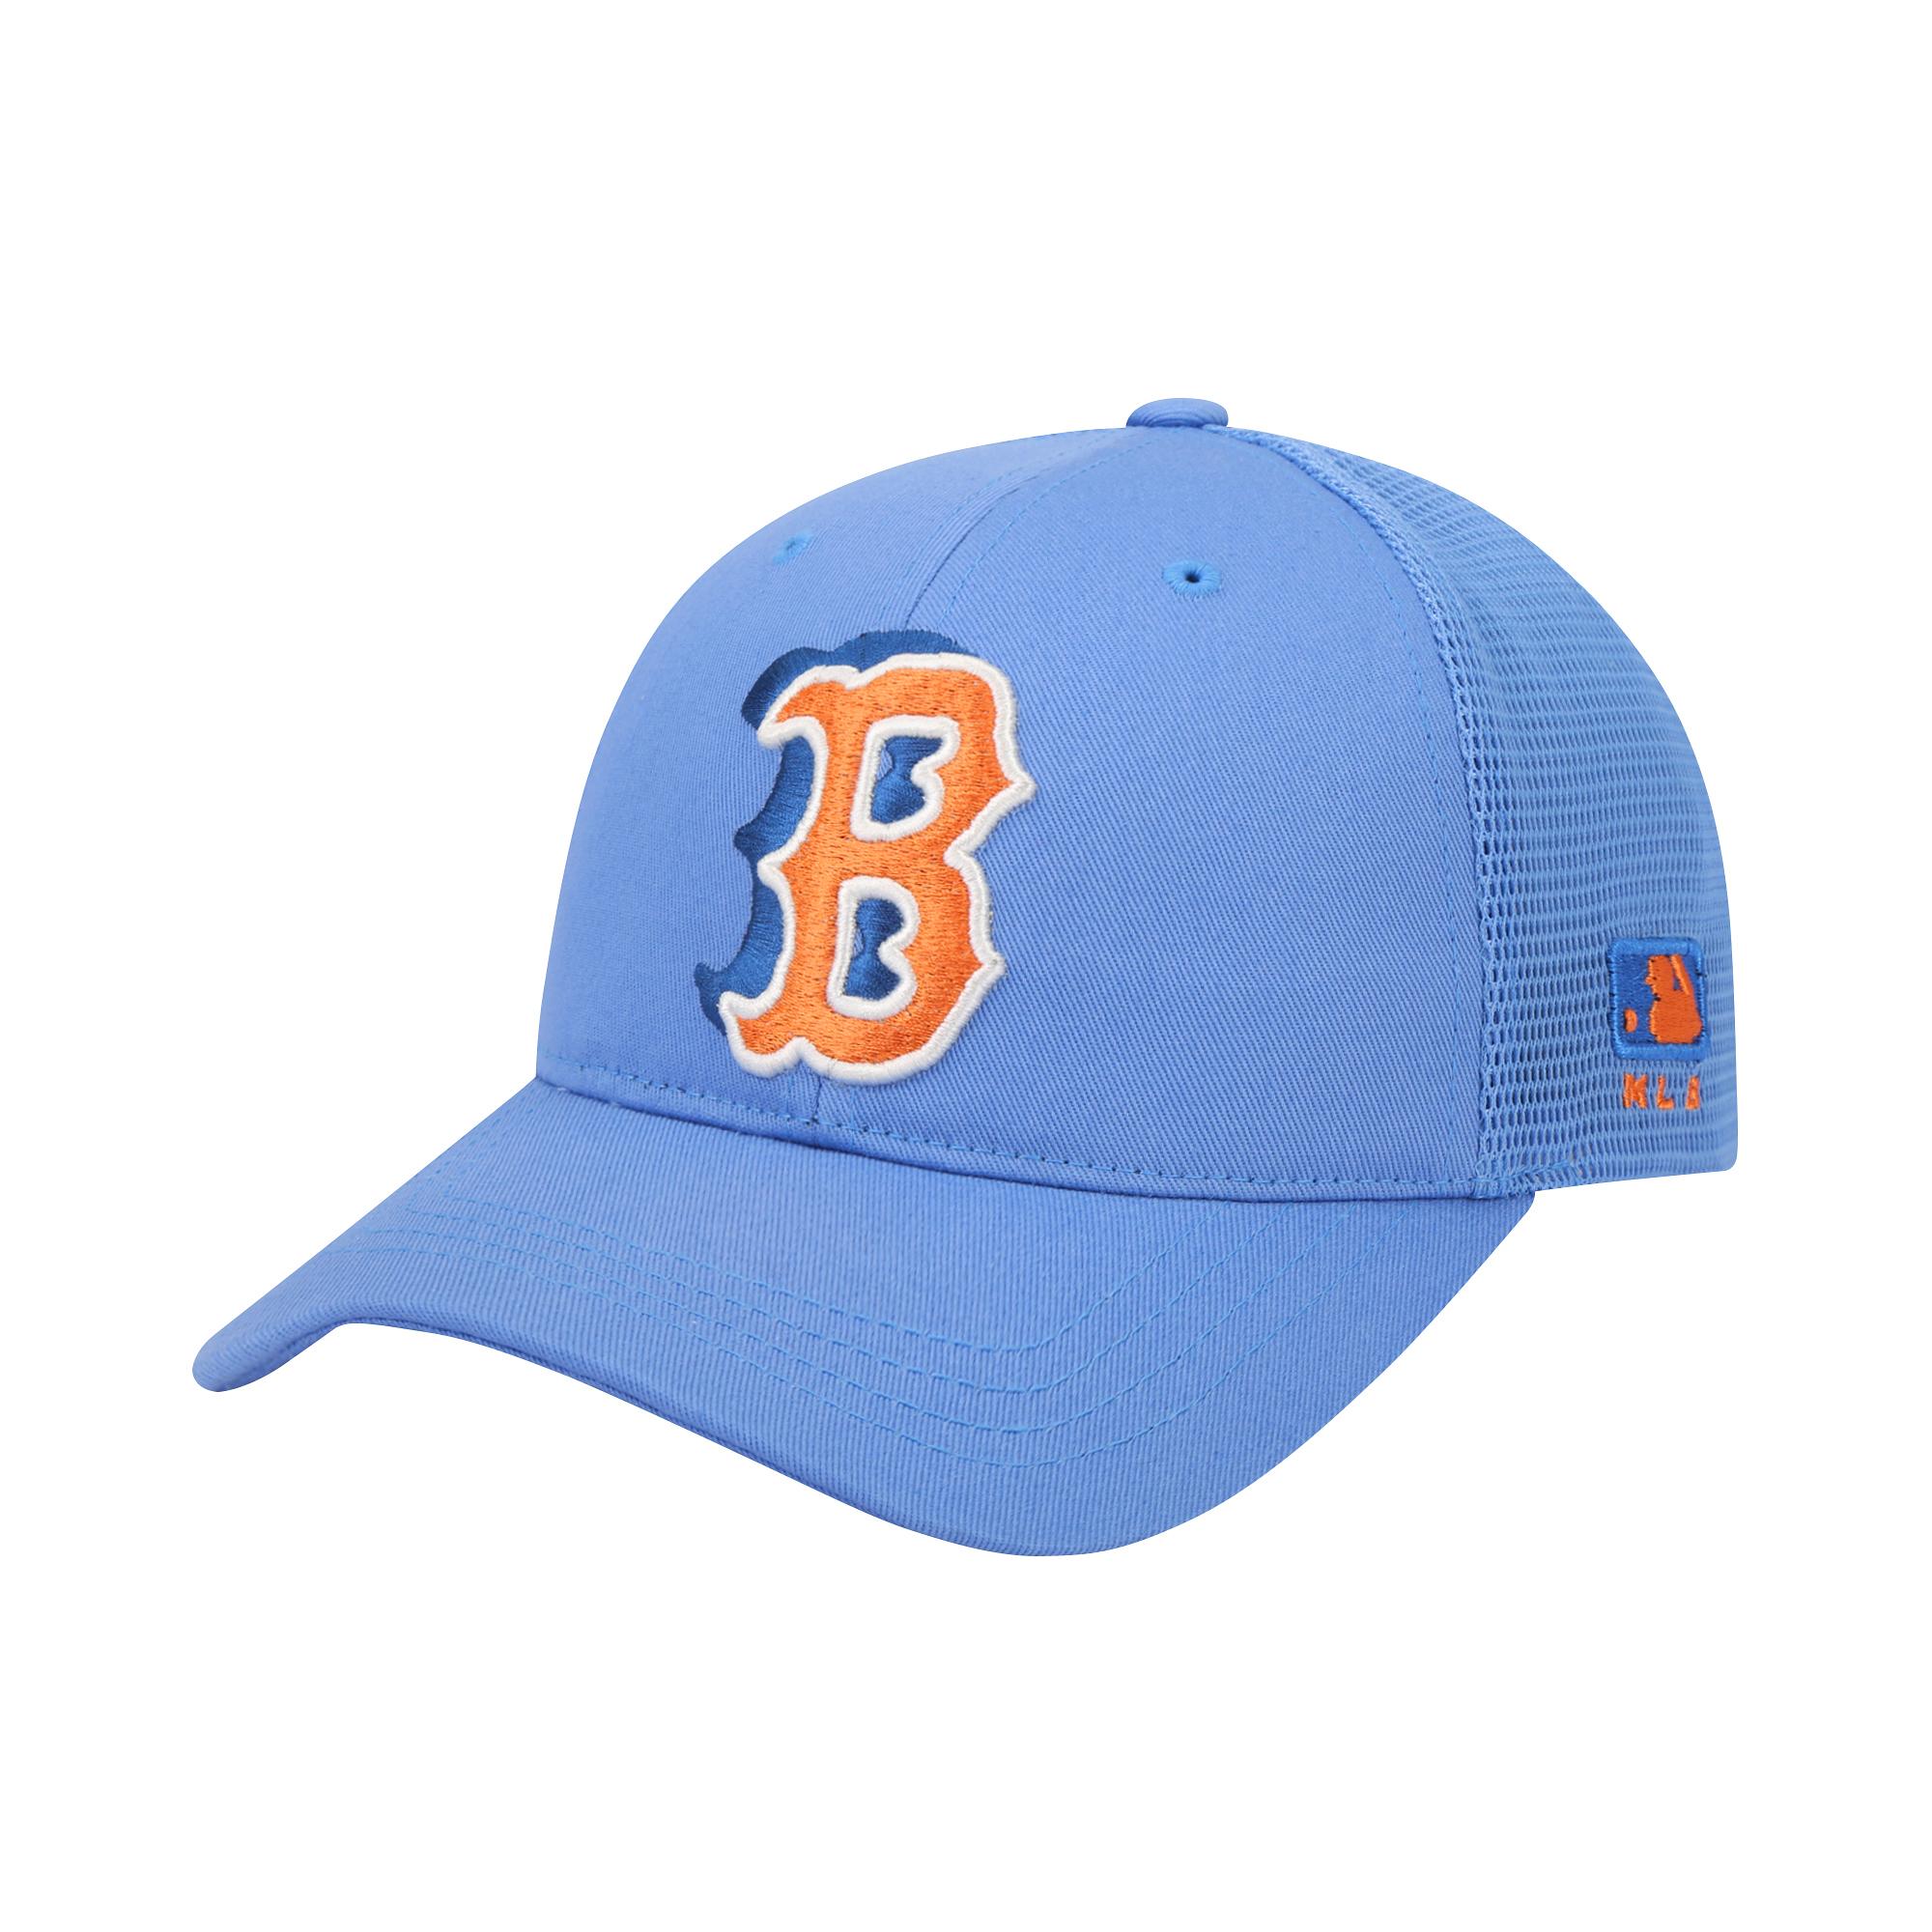 MLB LIKE 트러커 커브 보스턴 레드삭스